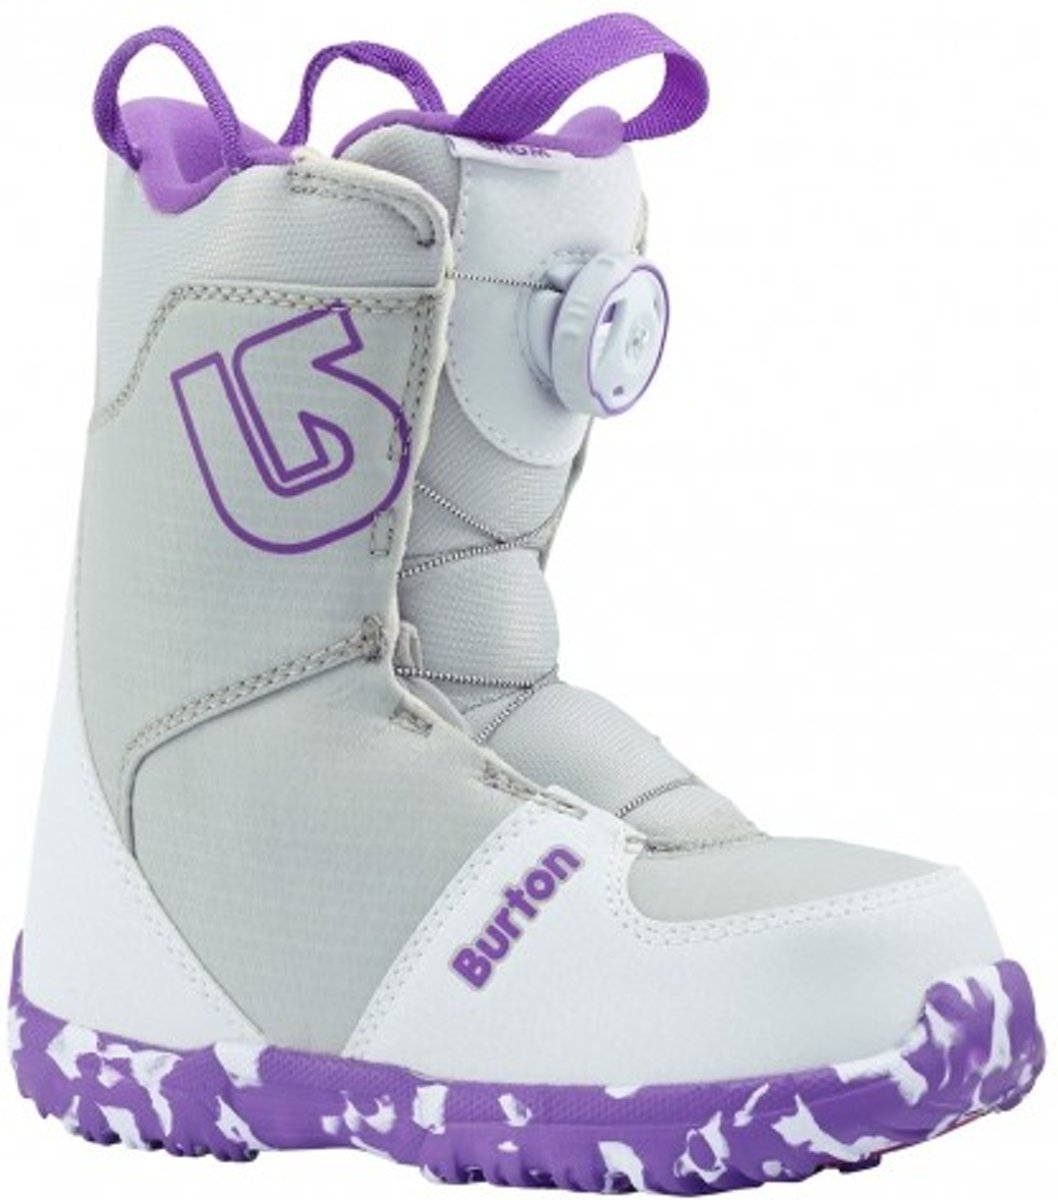 Burton Grom Boa kinder snowboardschoenen white/purple kopen